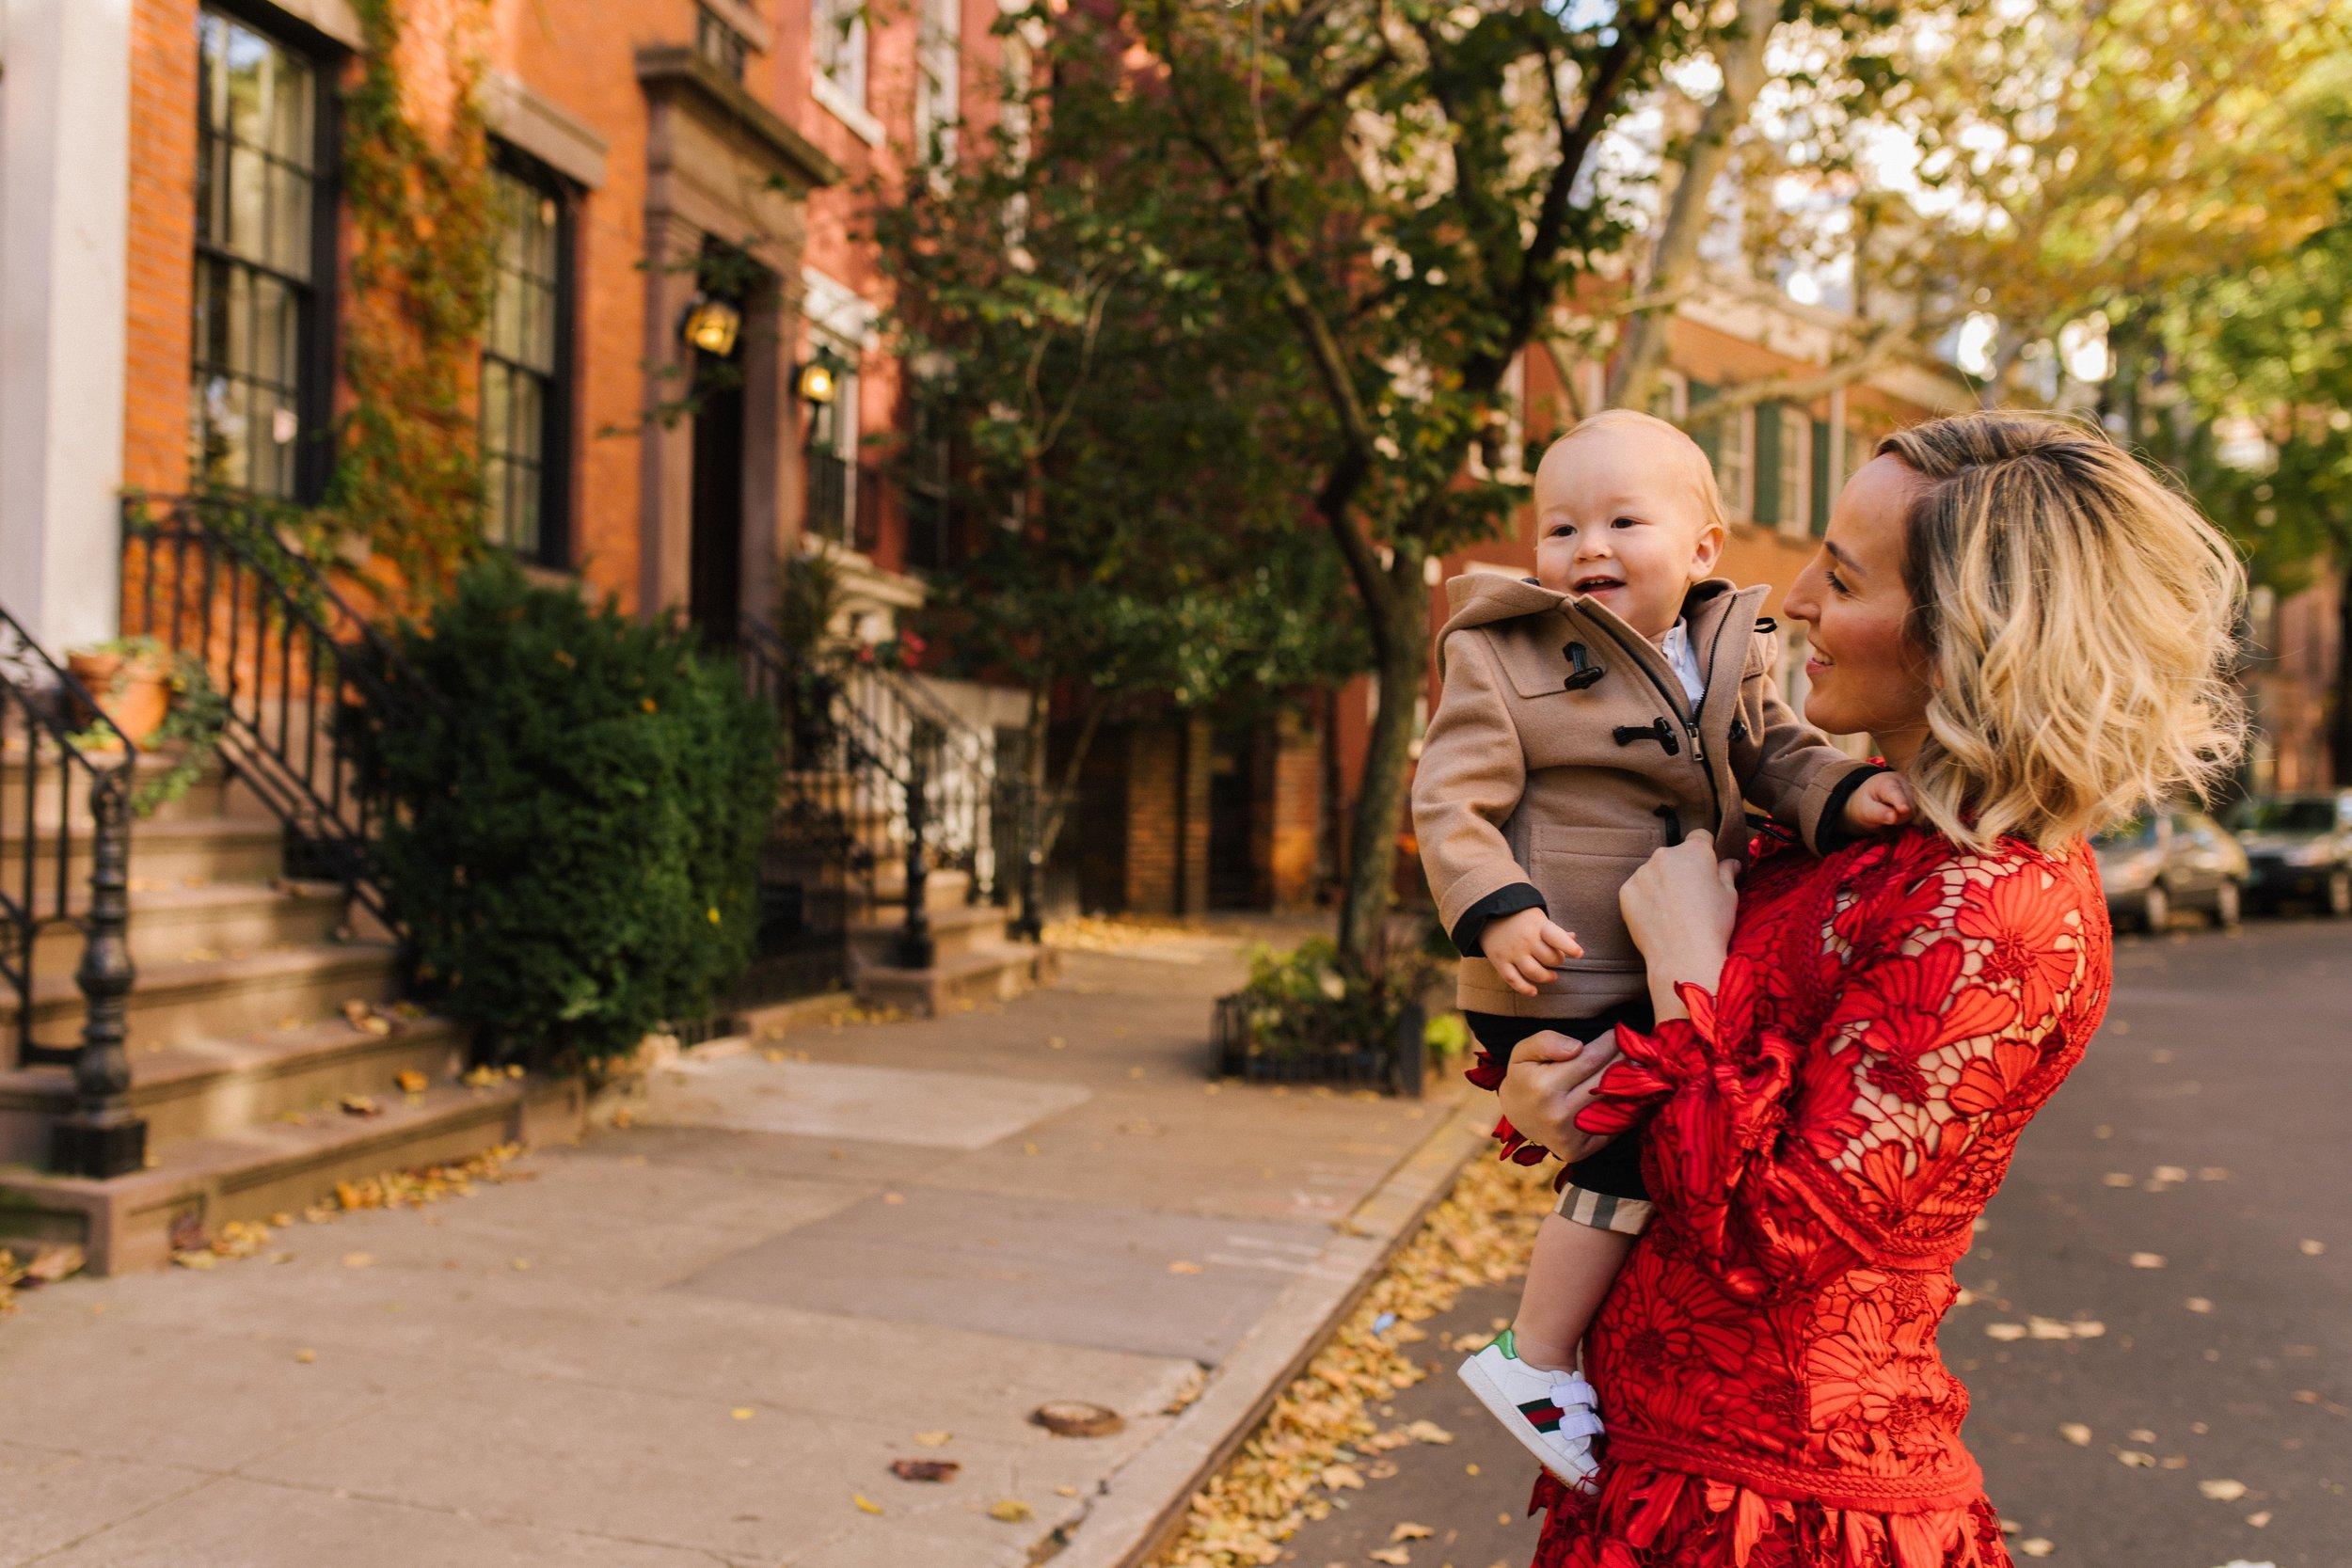 new_york_city_family_portrait_photographer (3 of 25).jpg